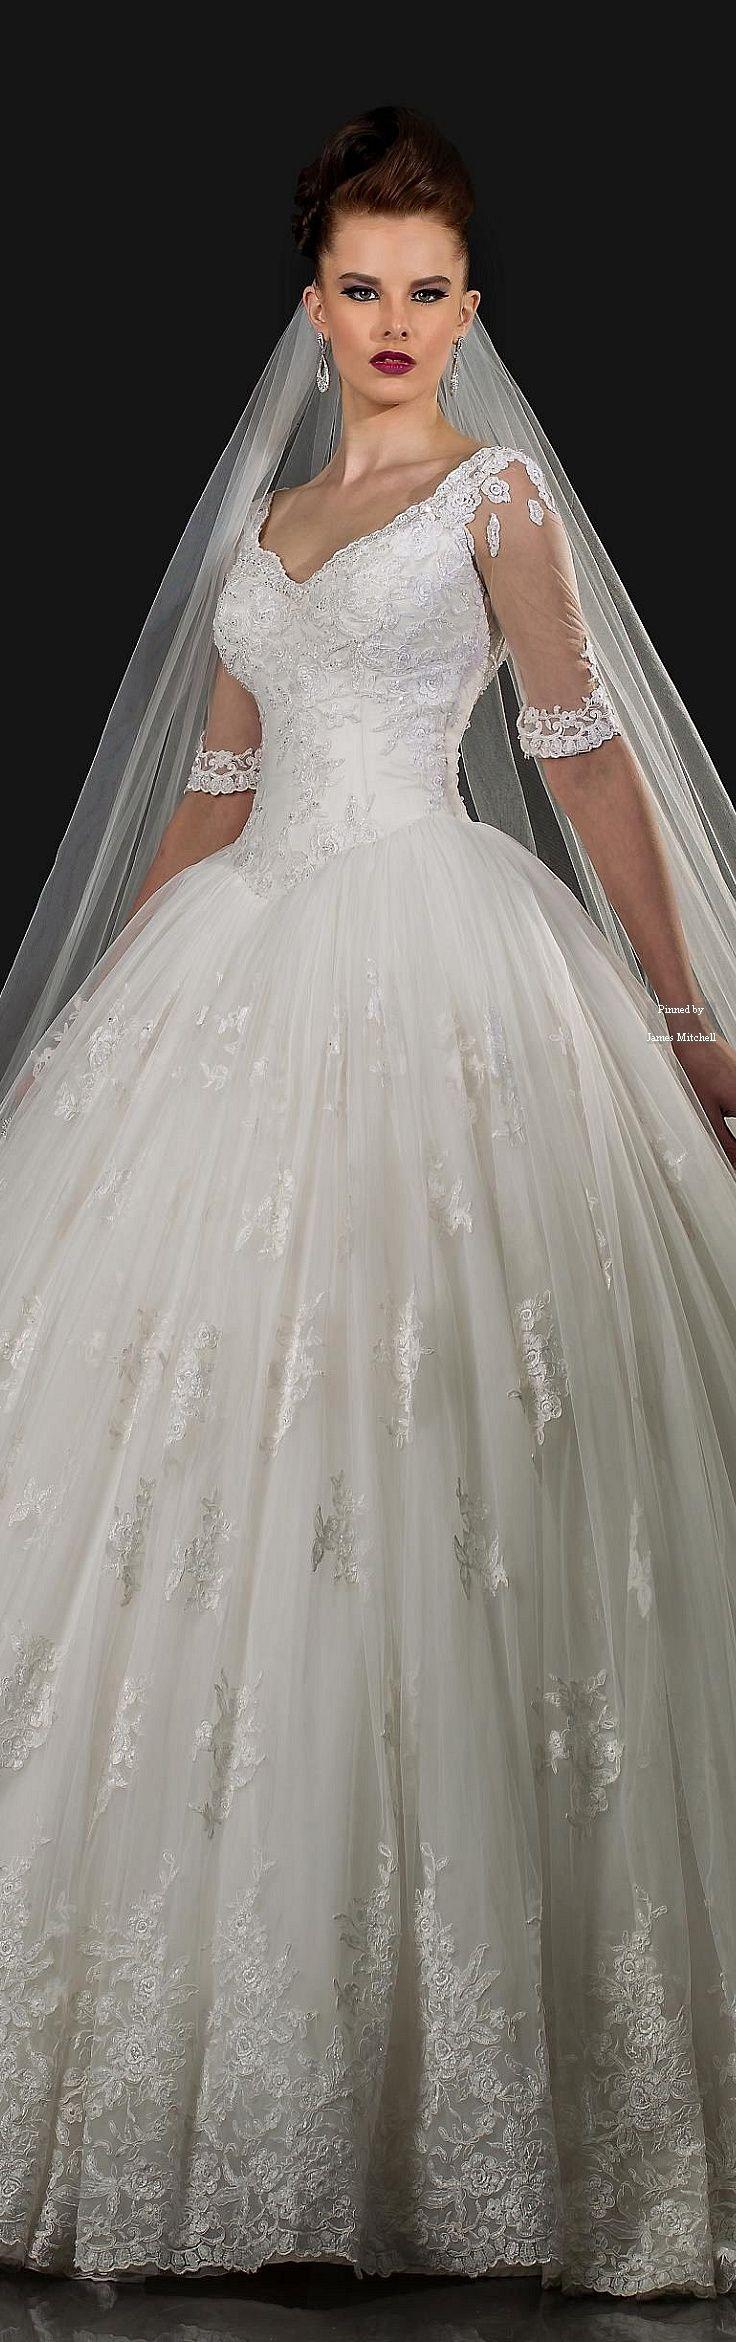 best wed enchantingly elegant bridal gowns images on